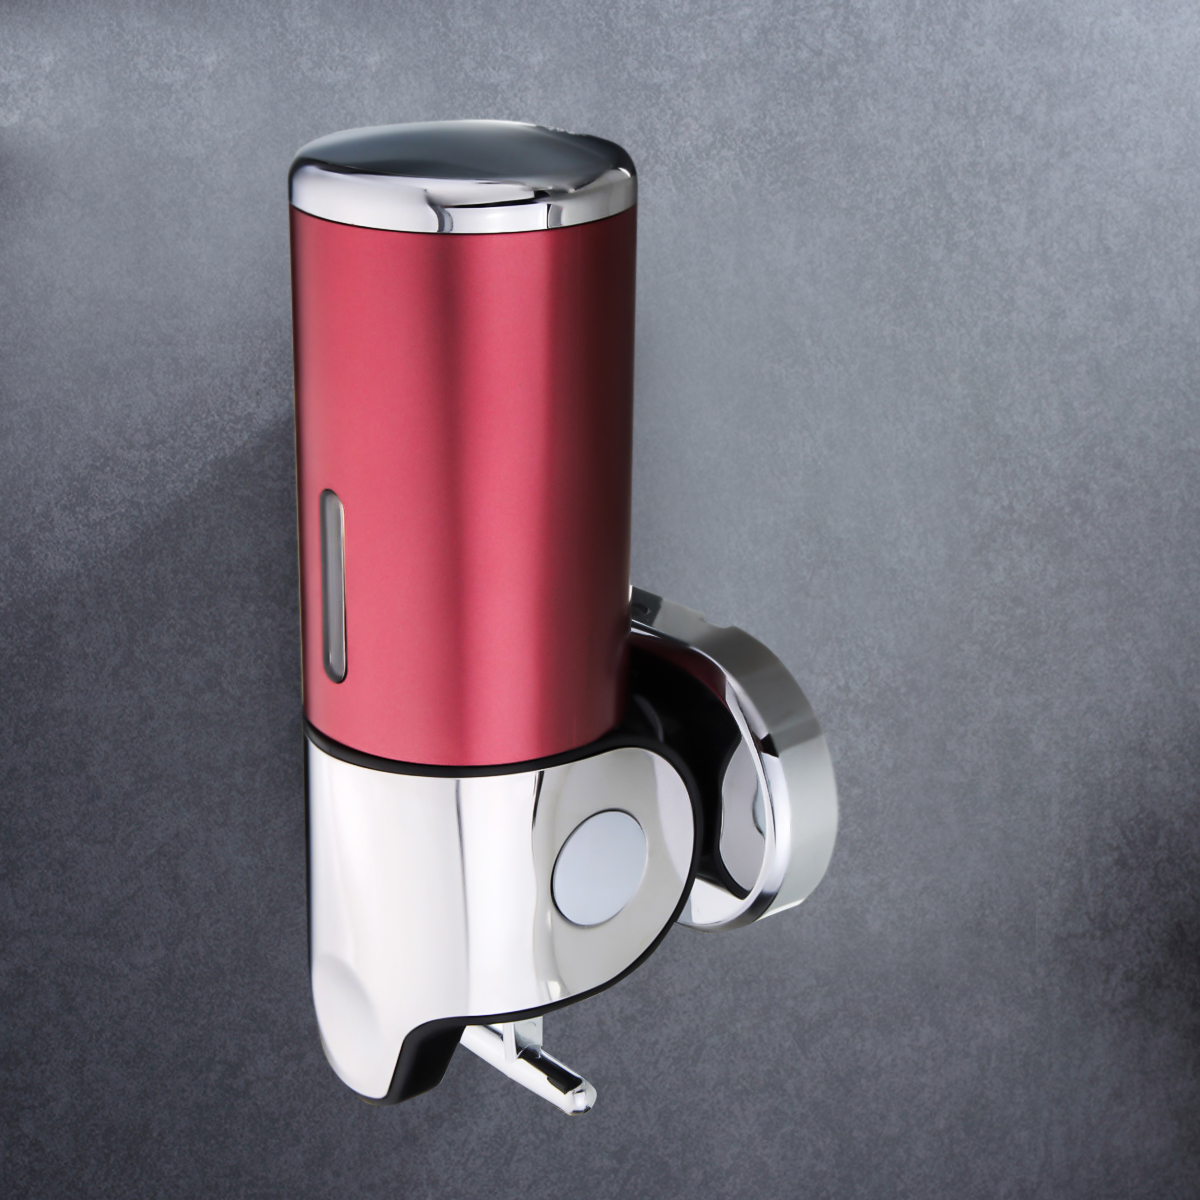 500ml Modern Wall Mounted Liquid Pumps Liquid Soap Gel Shampoo Dispenser Bathroom Washroom Shower Body Lotion Shampoo Liquid Soap Dispenser Lotion Pump